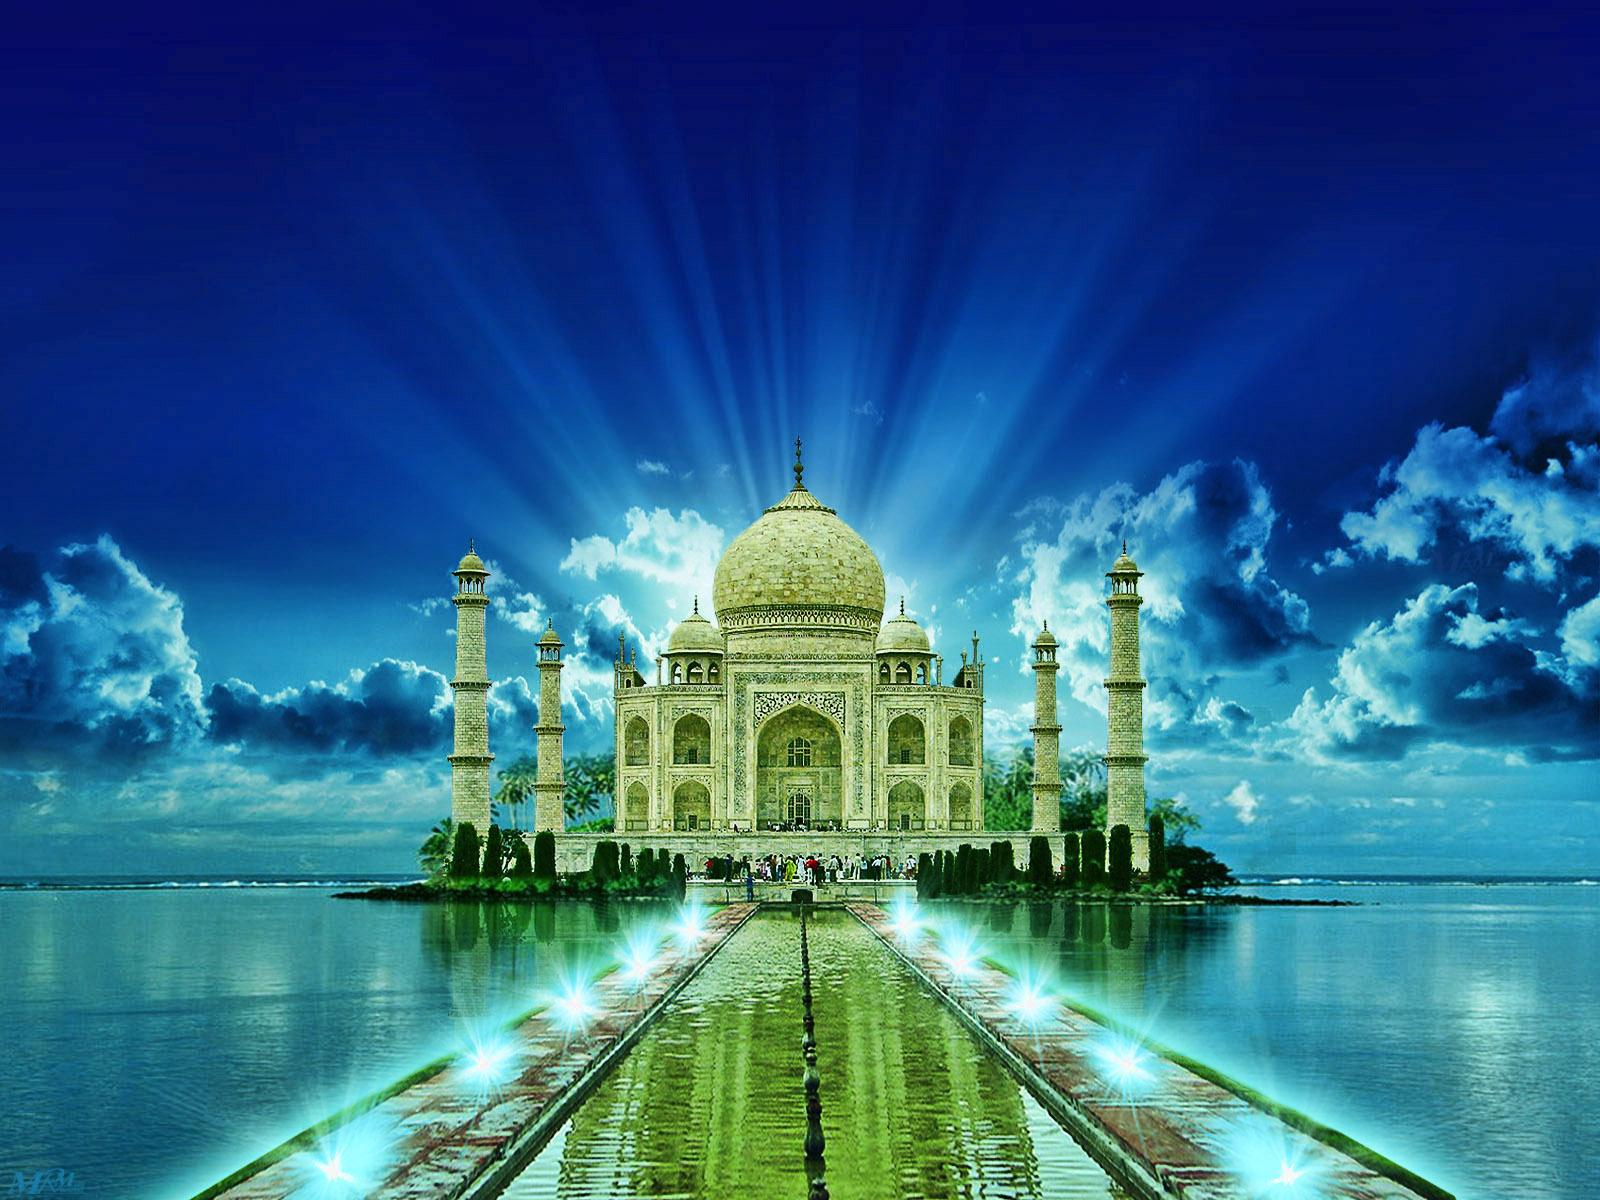 HD WALLPAPER GALLERY: Taj Mahal India Wallpaper